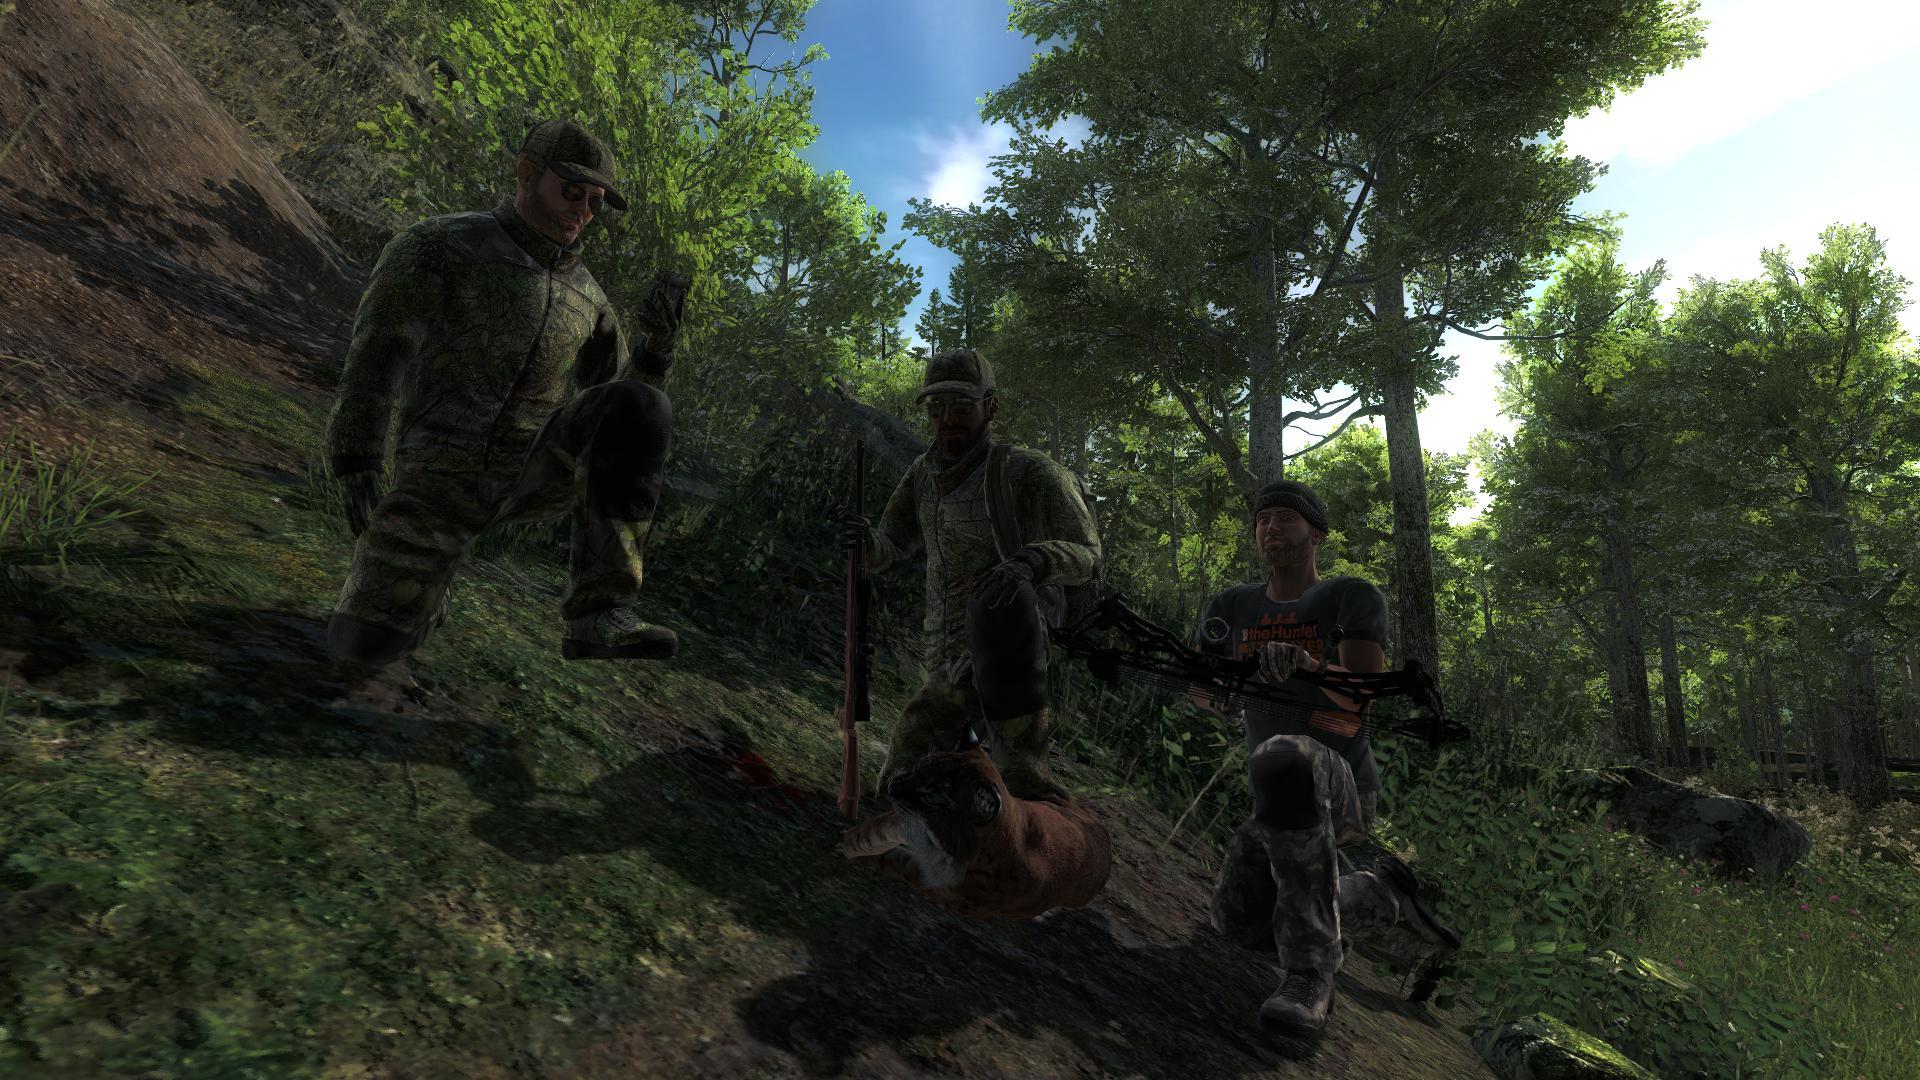 Fotografie in multiplayer con i Nostri AMICI - Pagina 15 Cc50b8e6147d41fd949f50f542b80eecf515b703